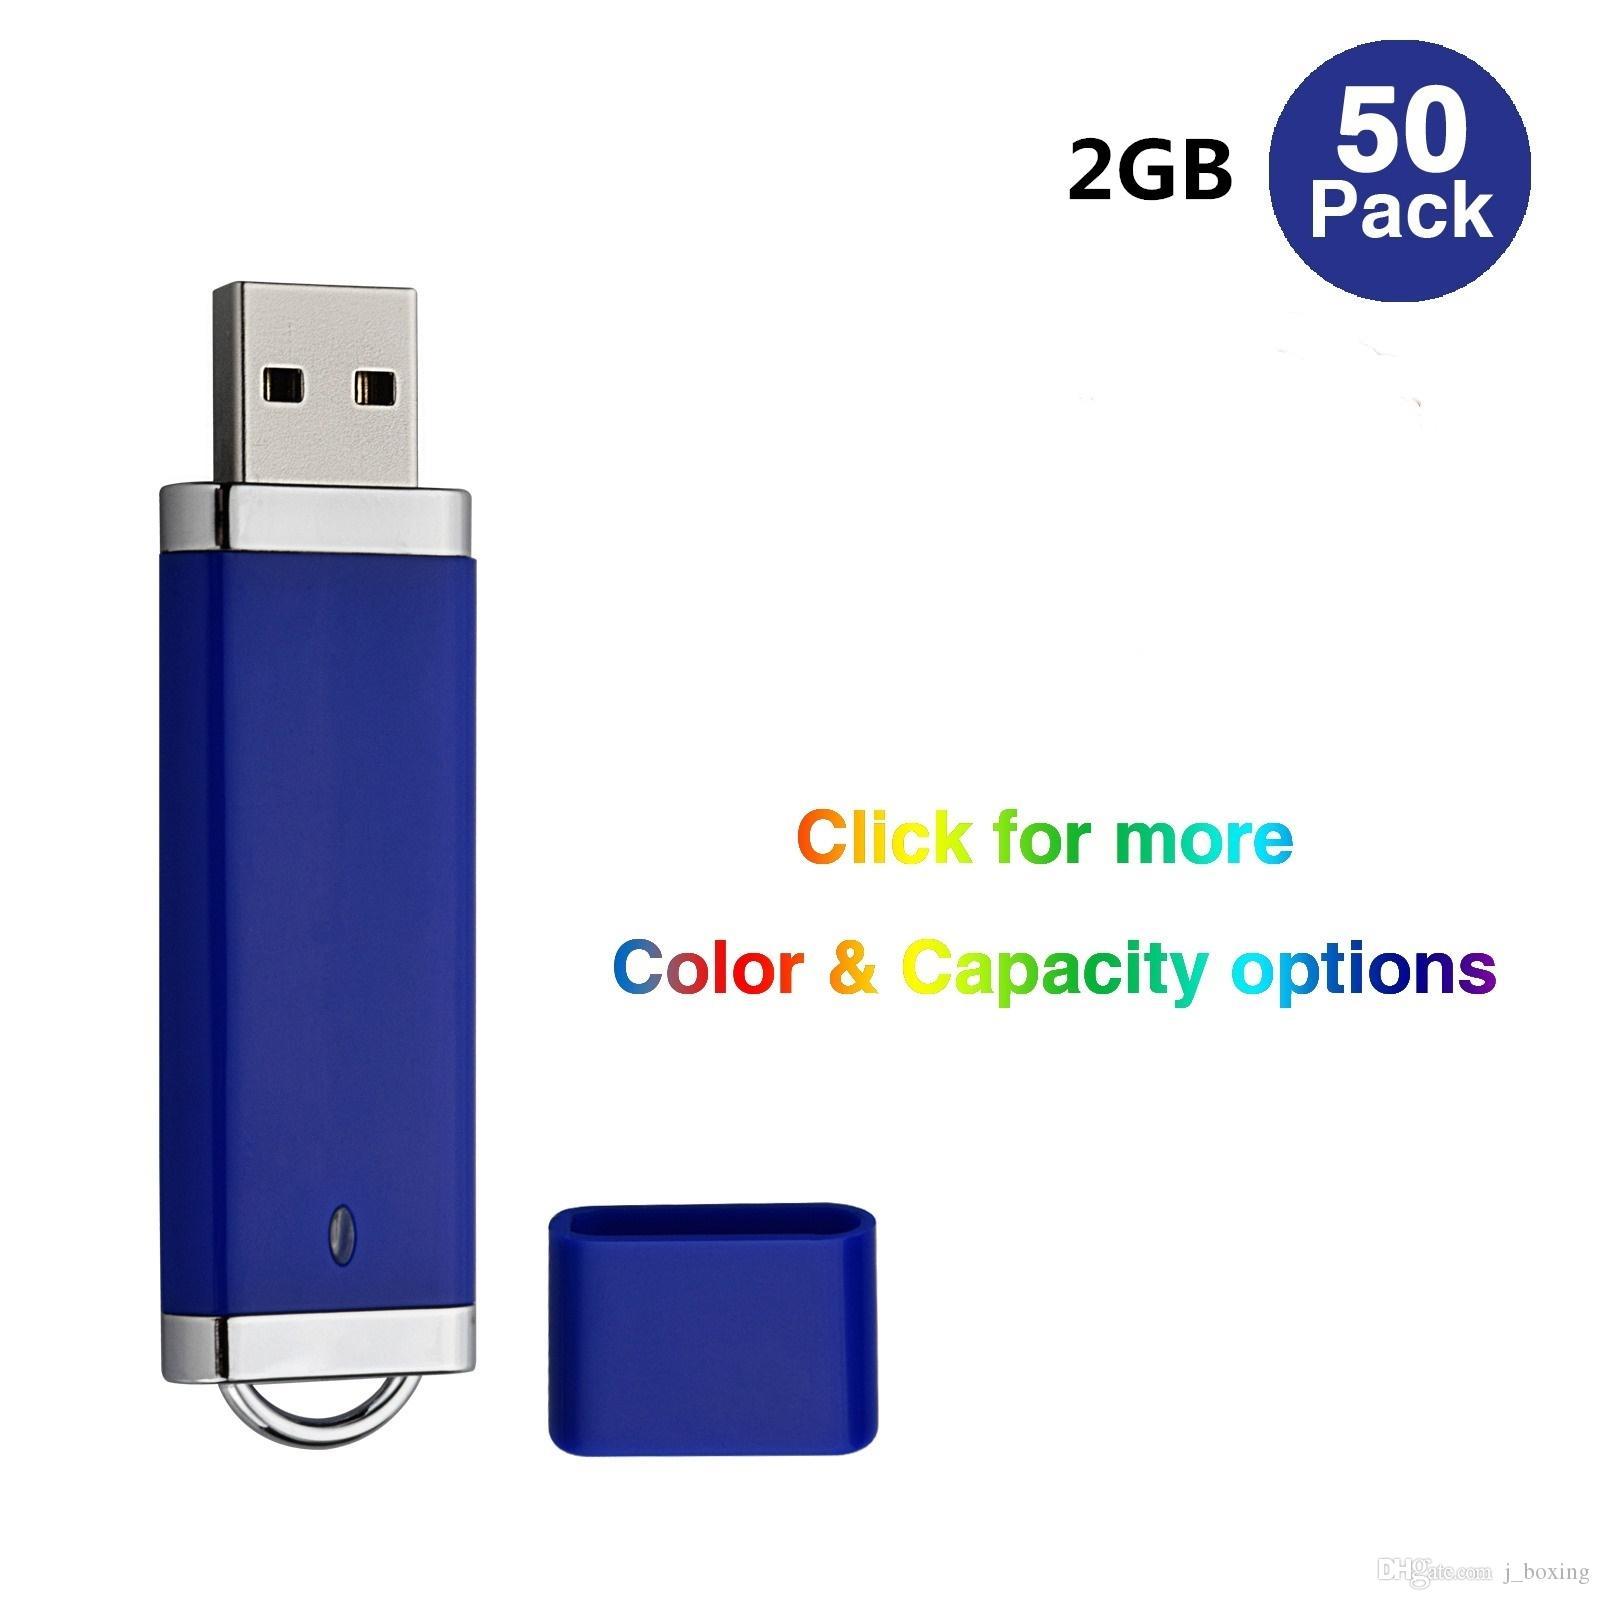 NEW 5PCS//Lot 1GB Storage USB2.0 Flash Drives Memory Sticks Thumb Pen Drive Stick